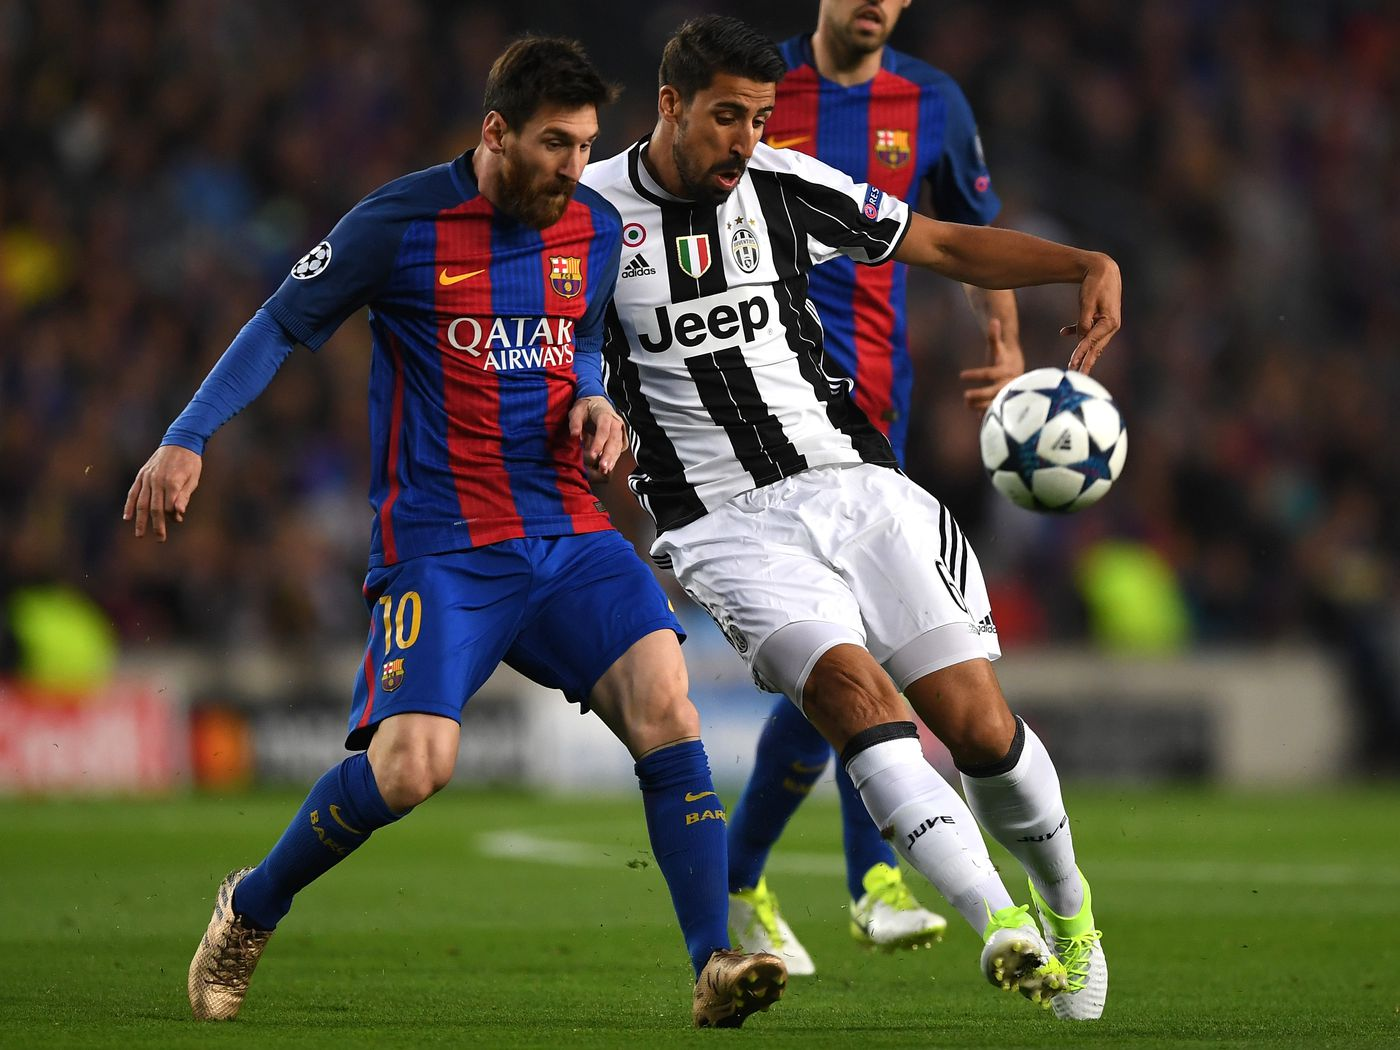 Barcelona Vs Juventus 2017 Final Score 0 0 Team Effort Puts Juve Into Champions League Semifinals Black White Read All Over